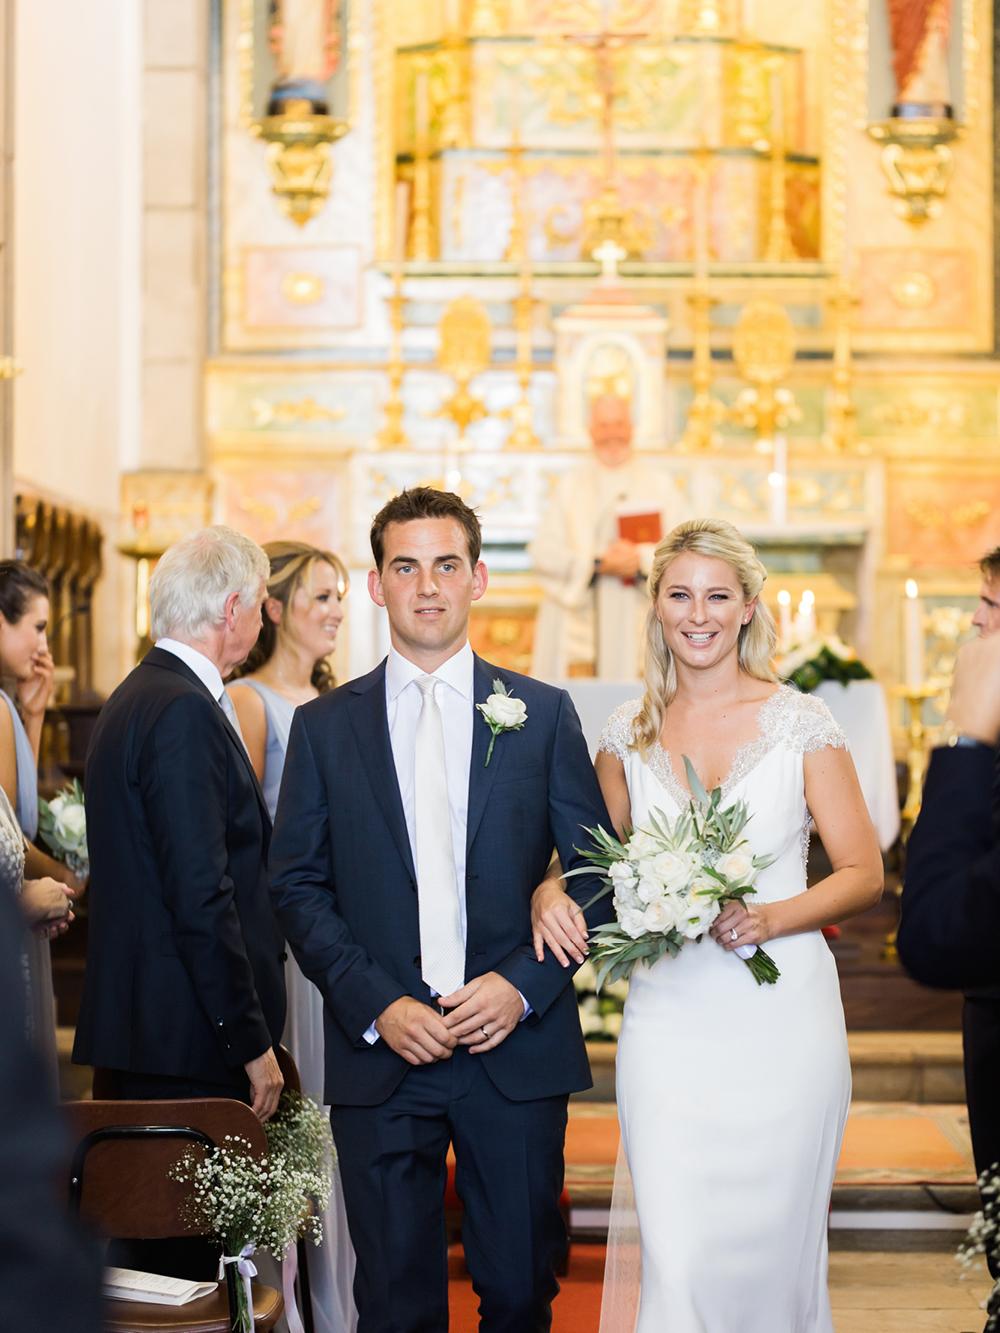 algarve_wedding_photography_eimear_marc_26.jpg